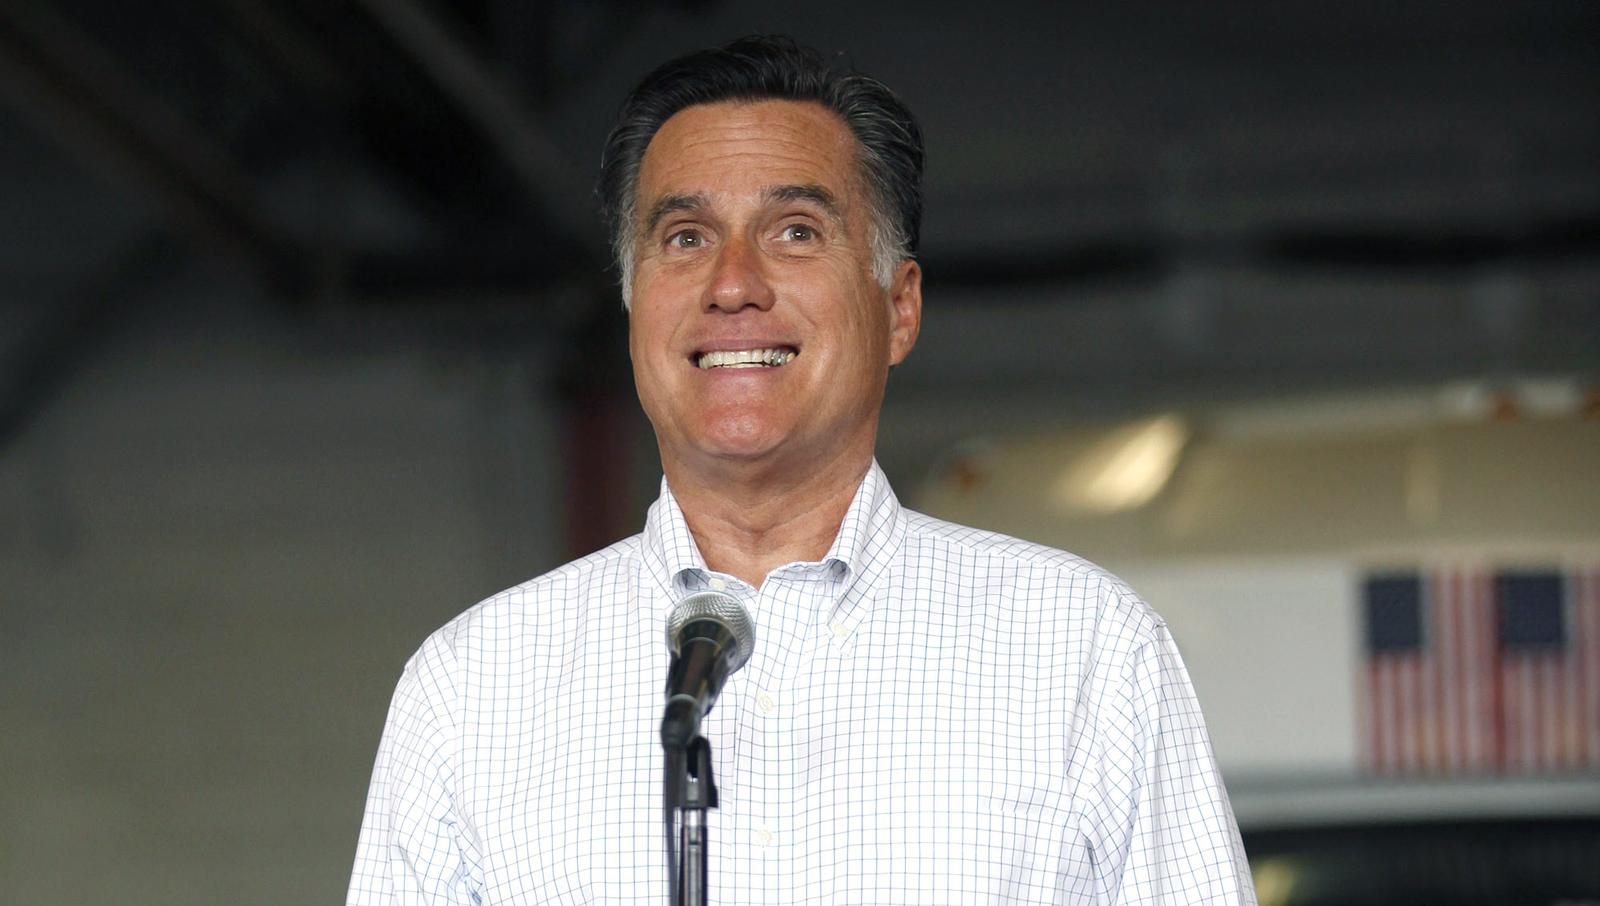 Romney Stuck In Endless Loop Of Uncomfortable Chuckling